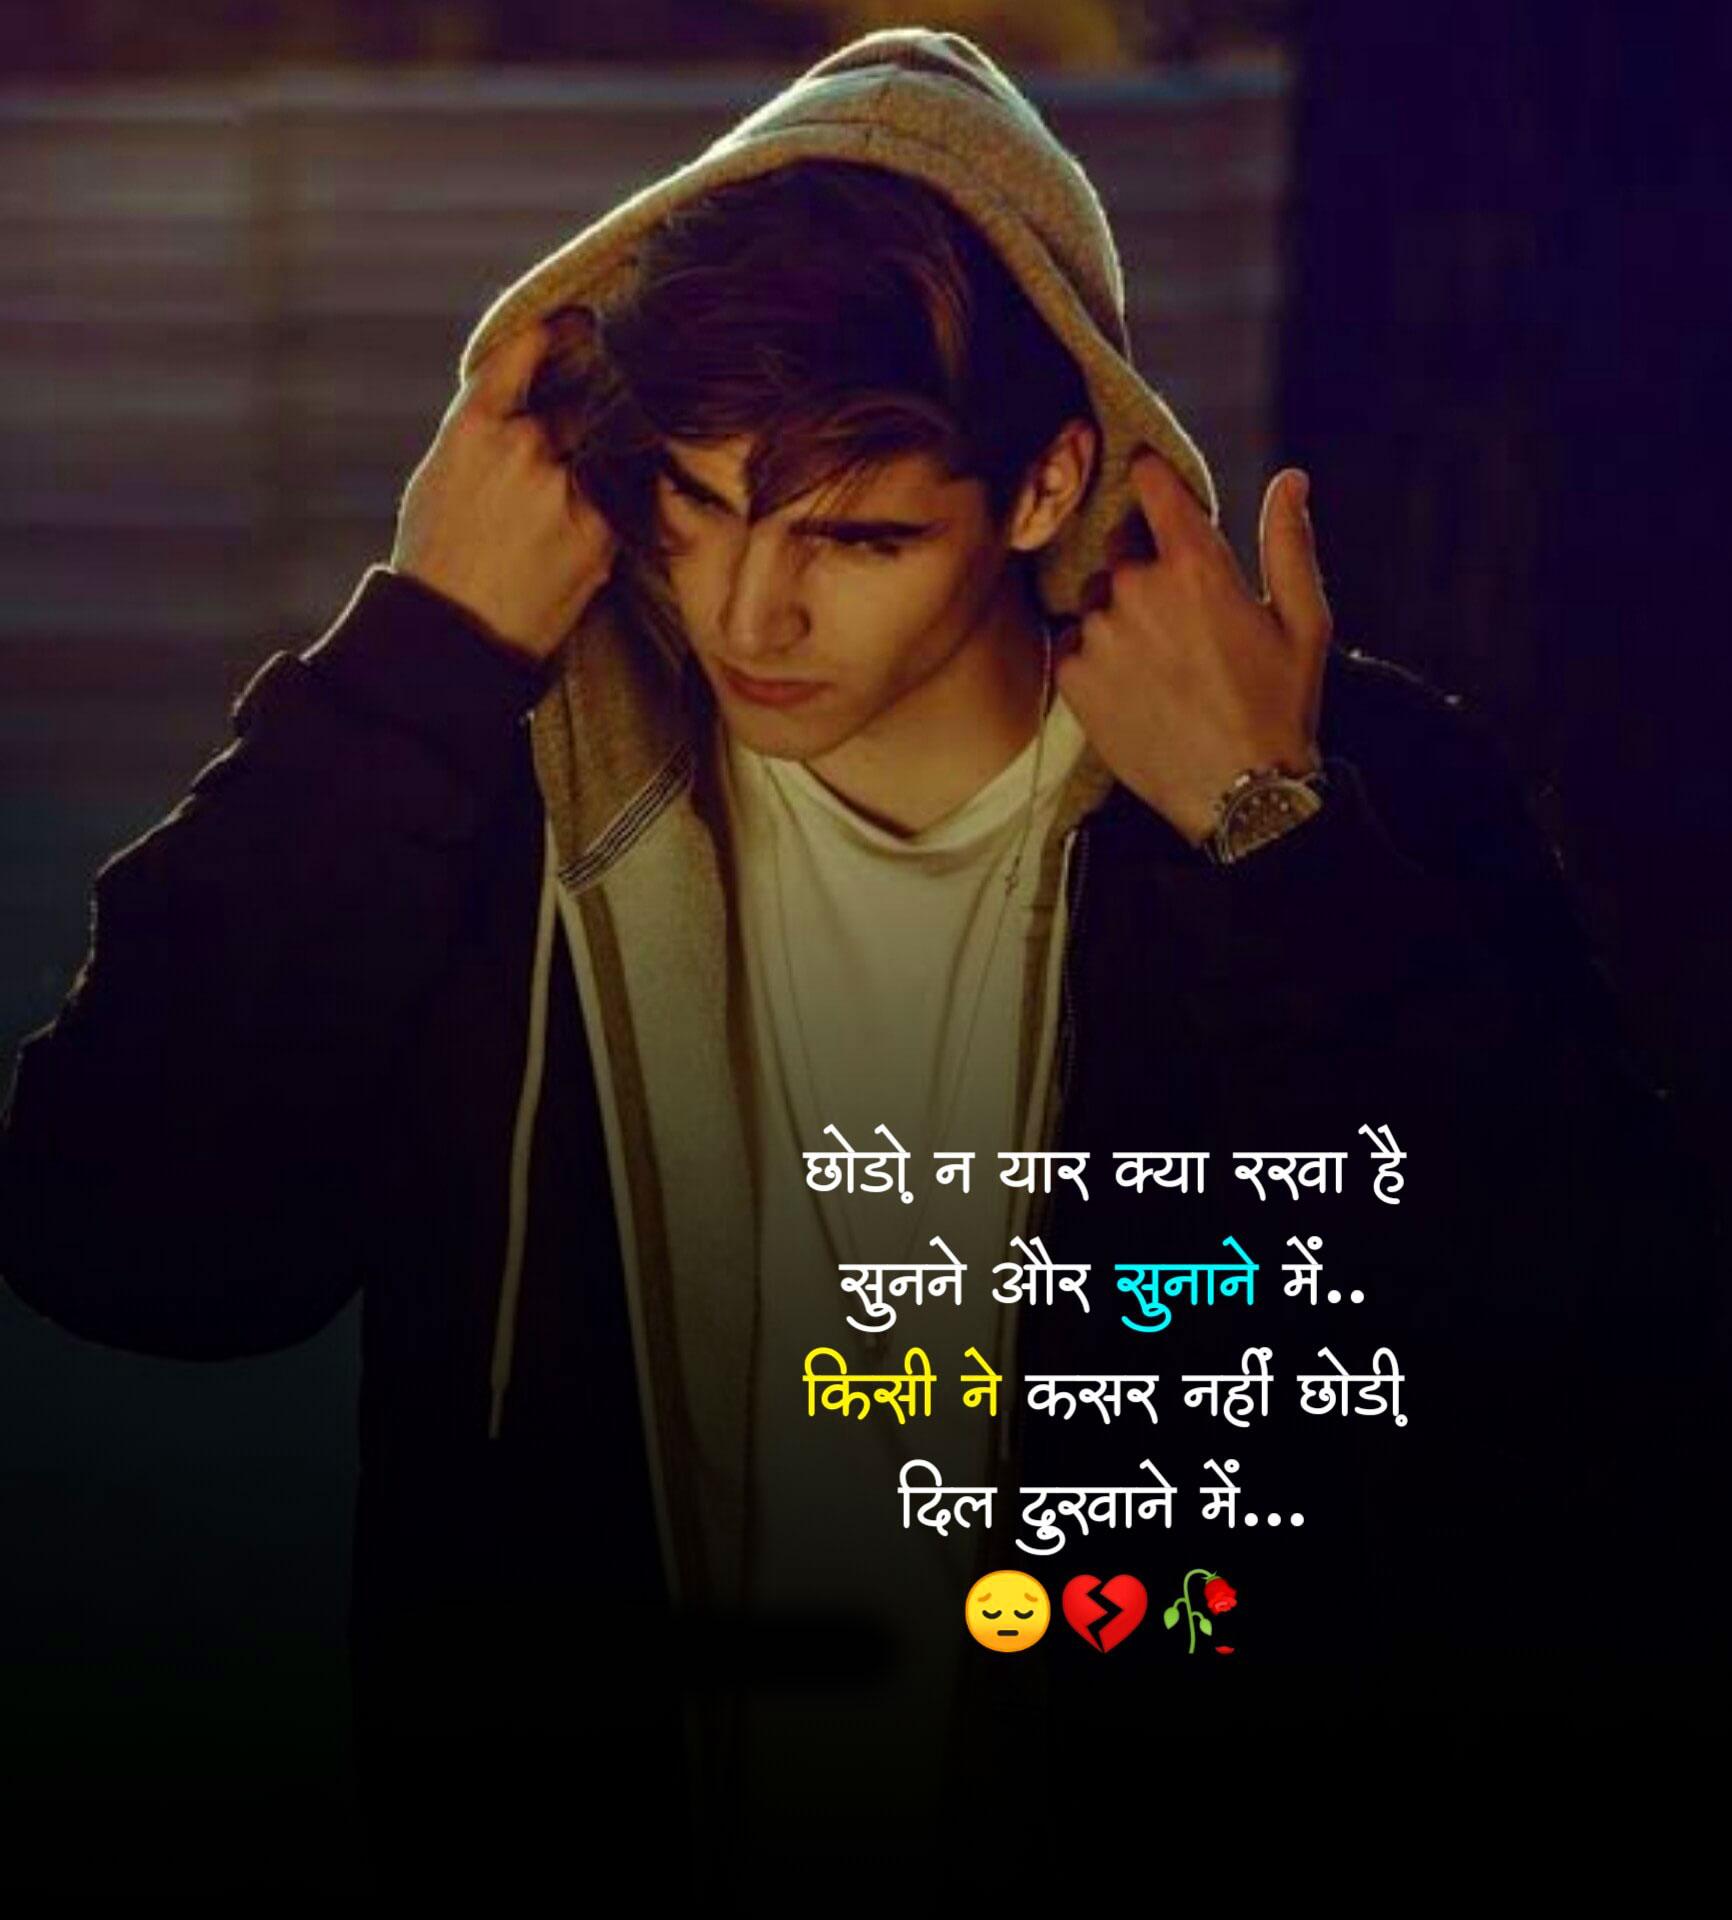 hd New Sad Boy Shayari Images